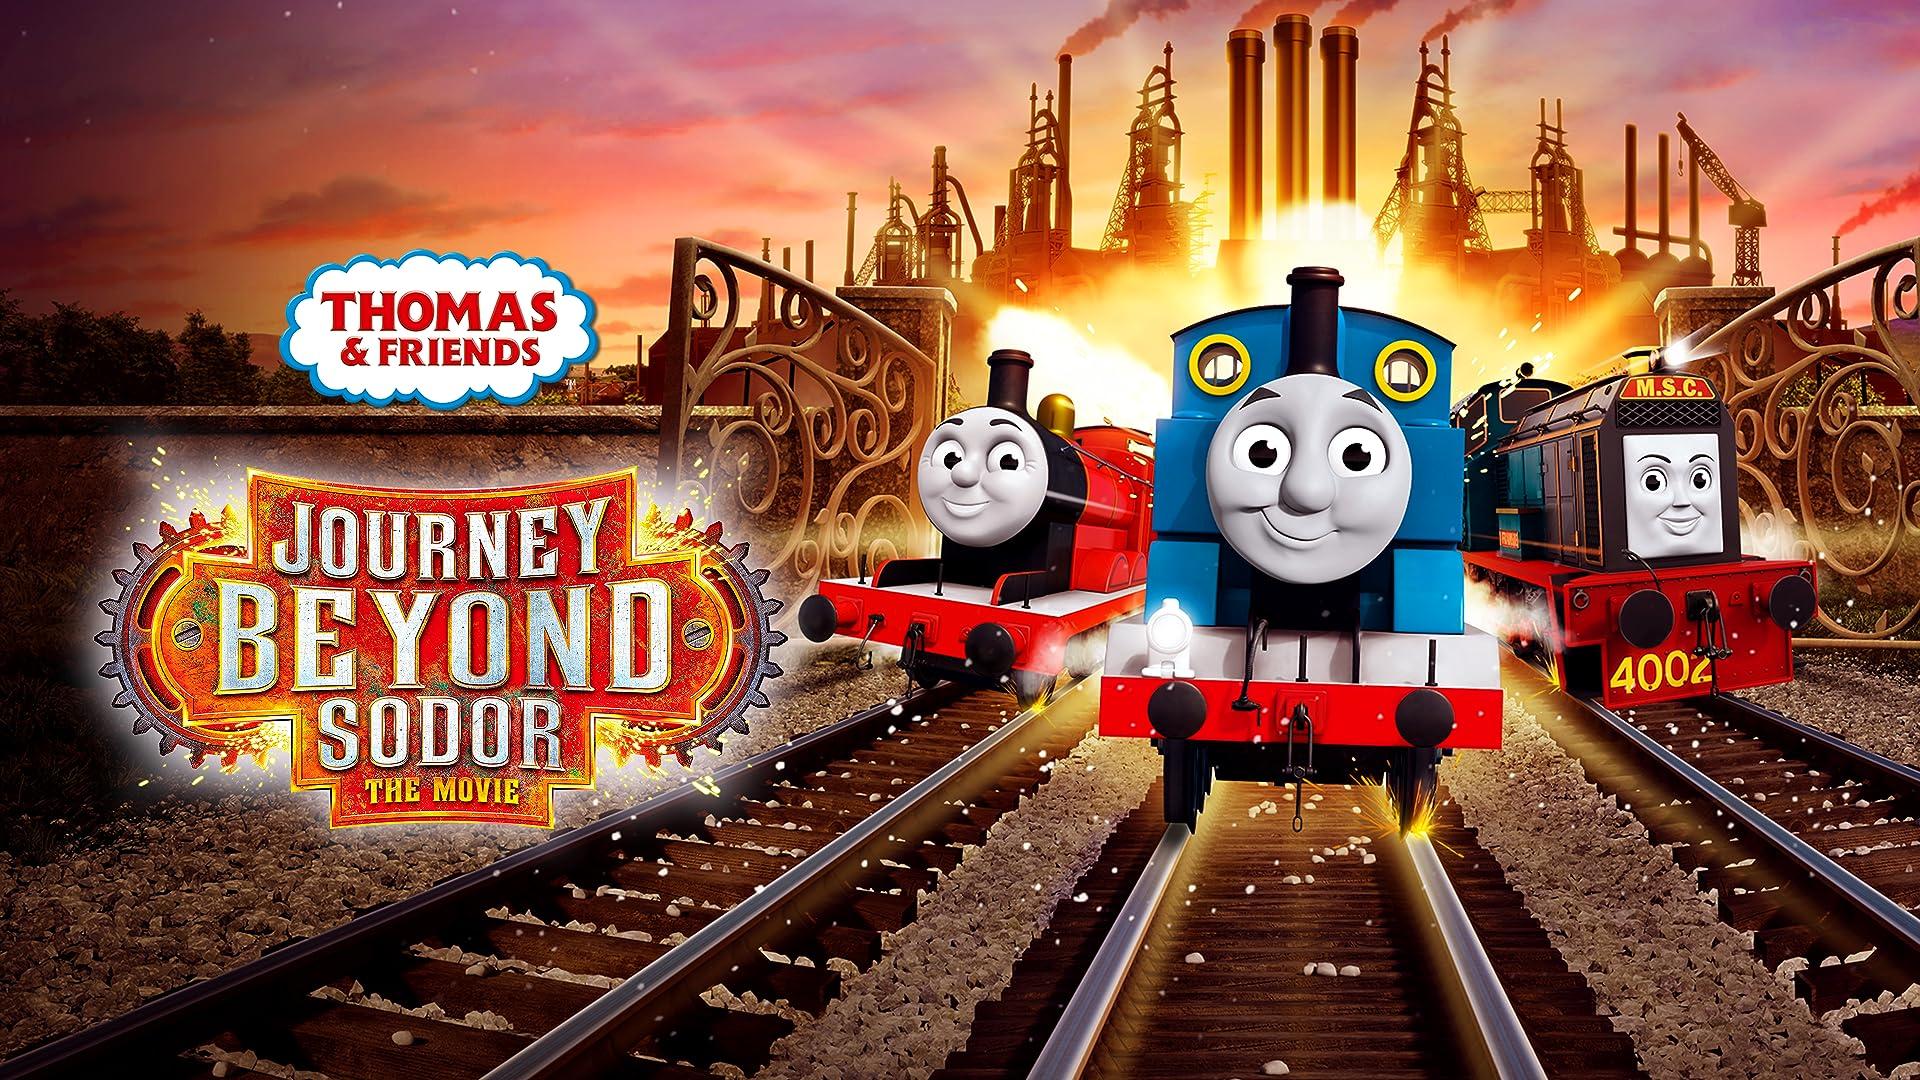 Thomas & Friends: Journey Beyond Sodor (US English, Brazilian Portuguese, Latin America Spanish)